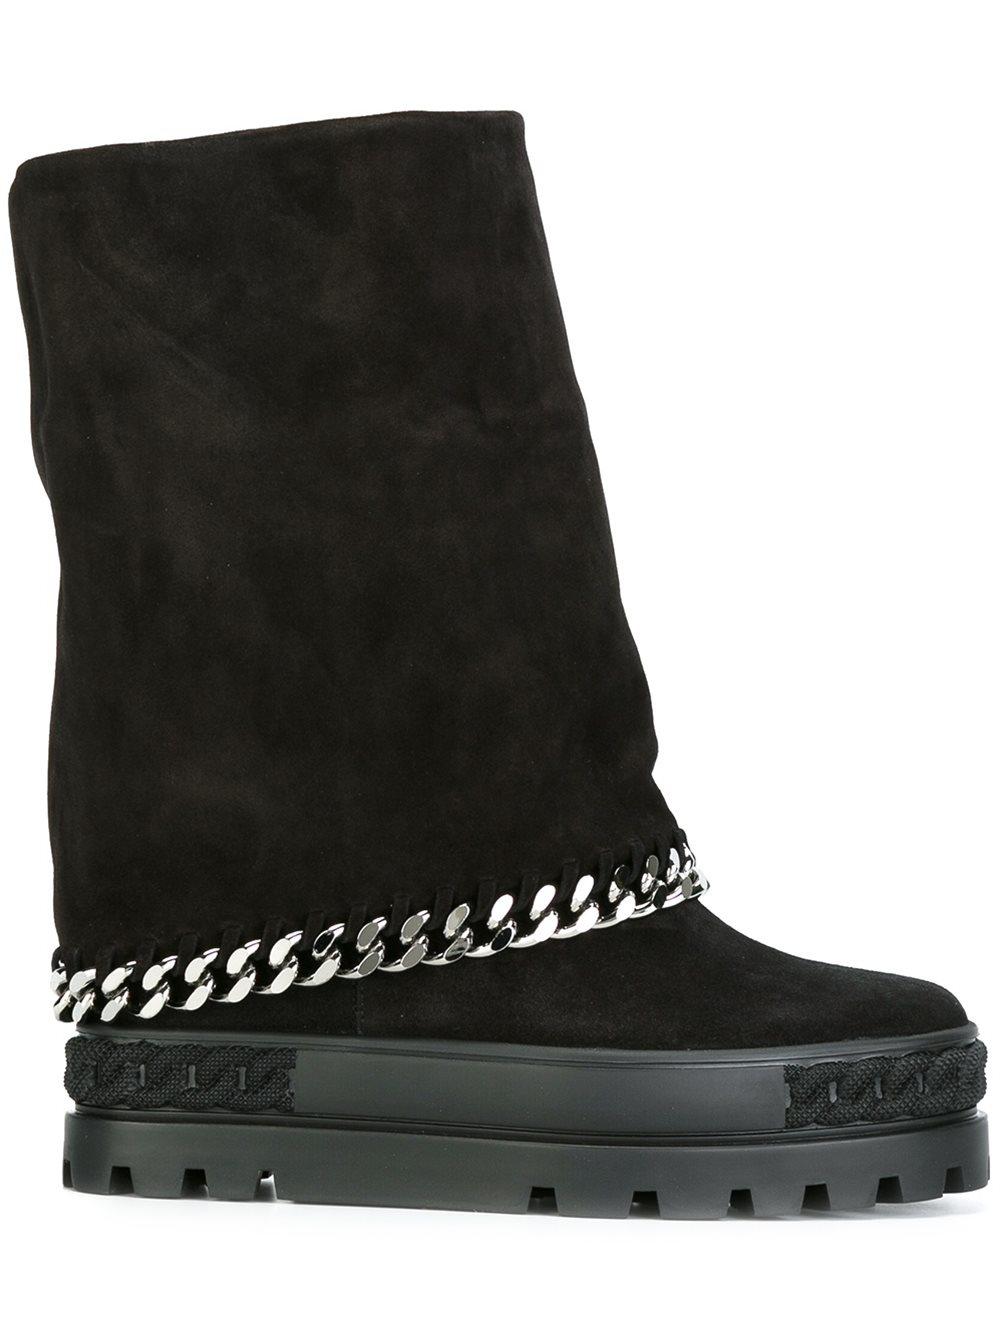 Casadei Double Rubber Sole Sneakers In Black Lyst